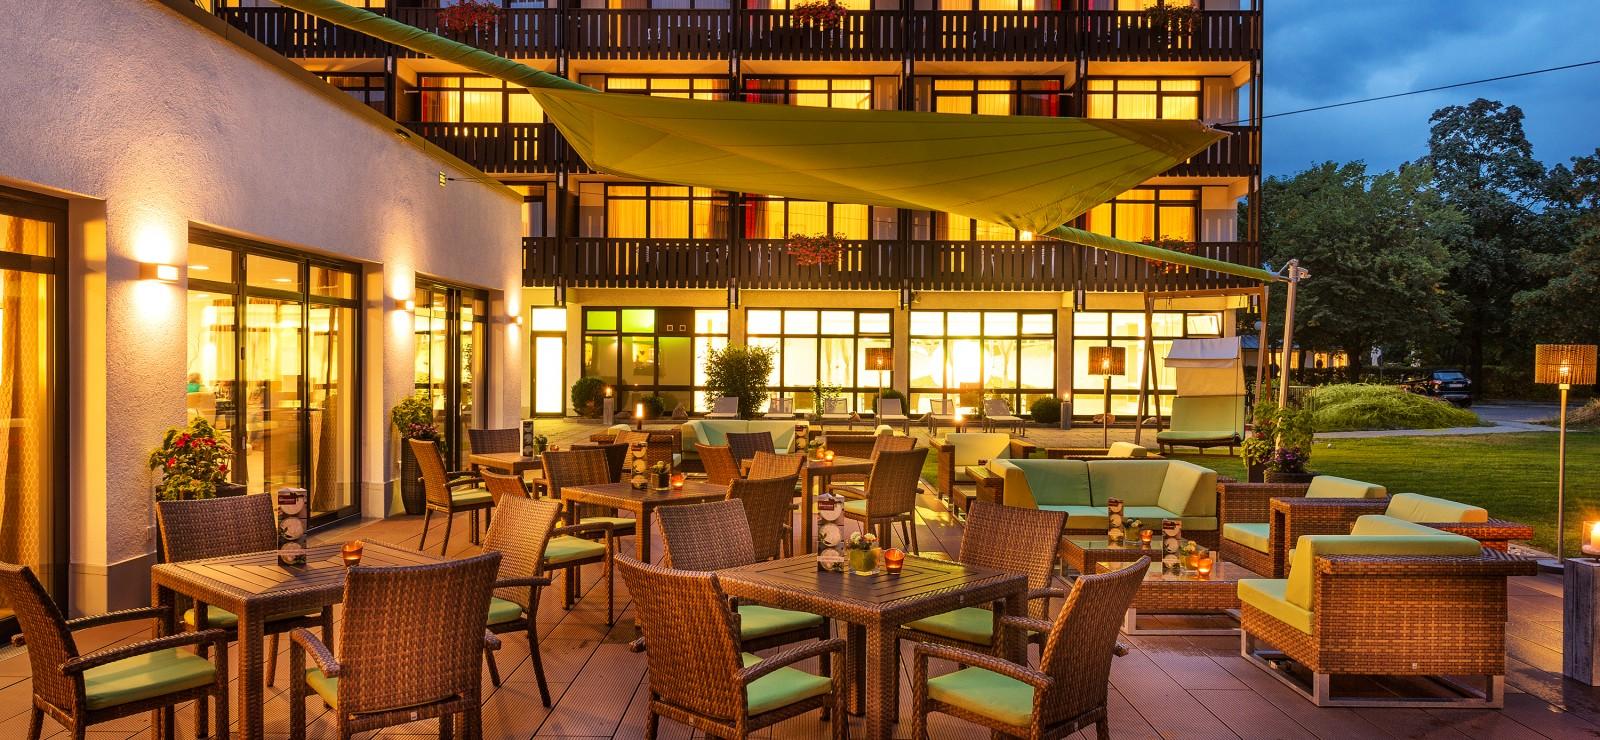 Johannesbad Hotel Königshof Bilder | Bild 1